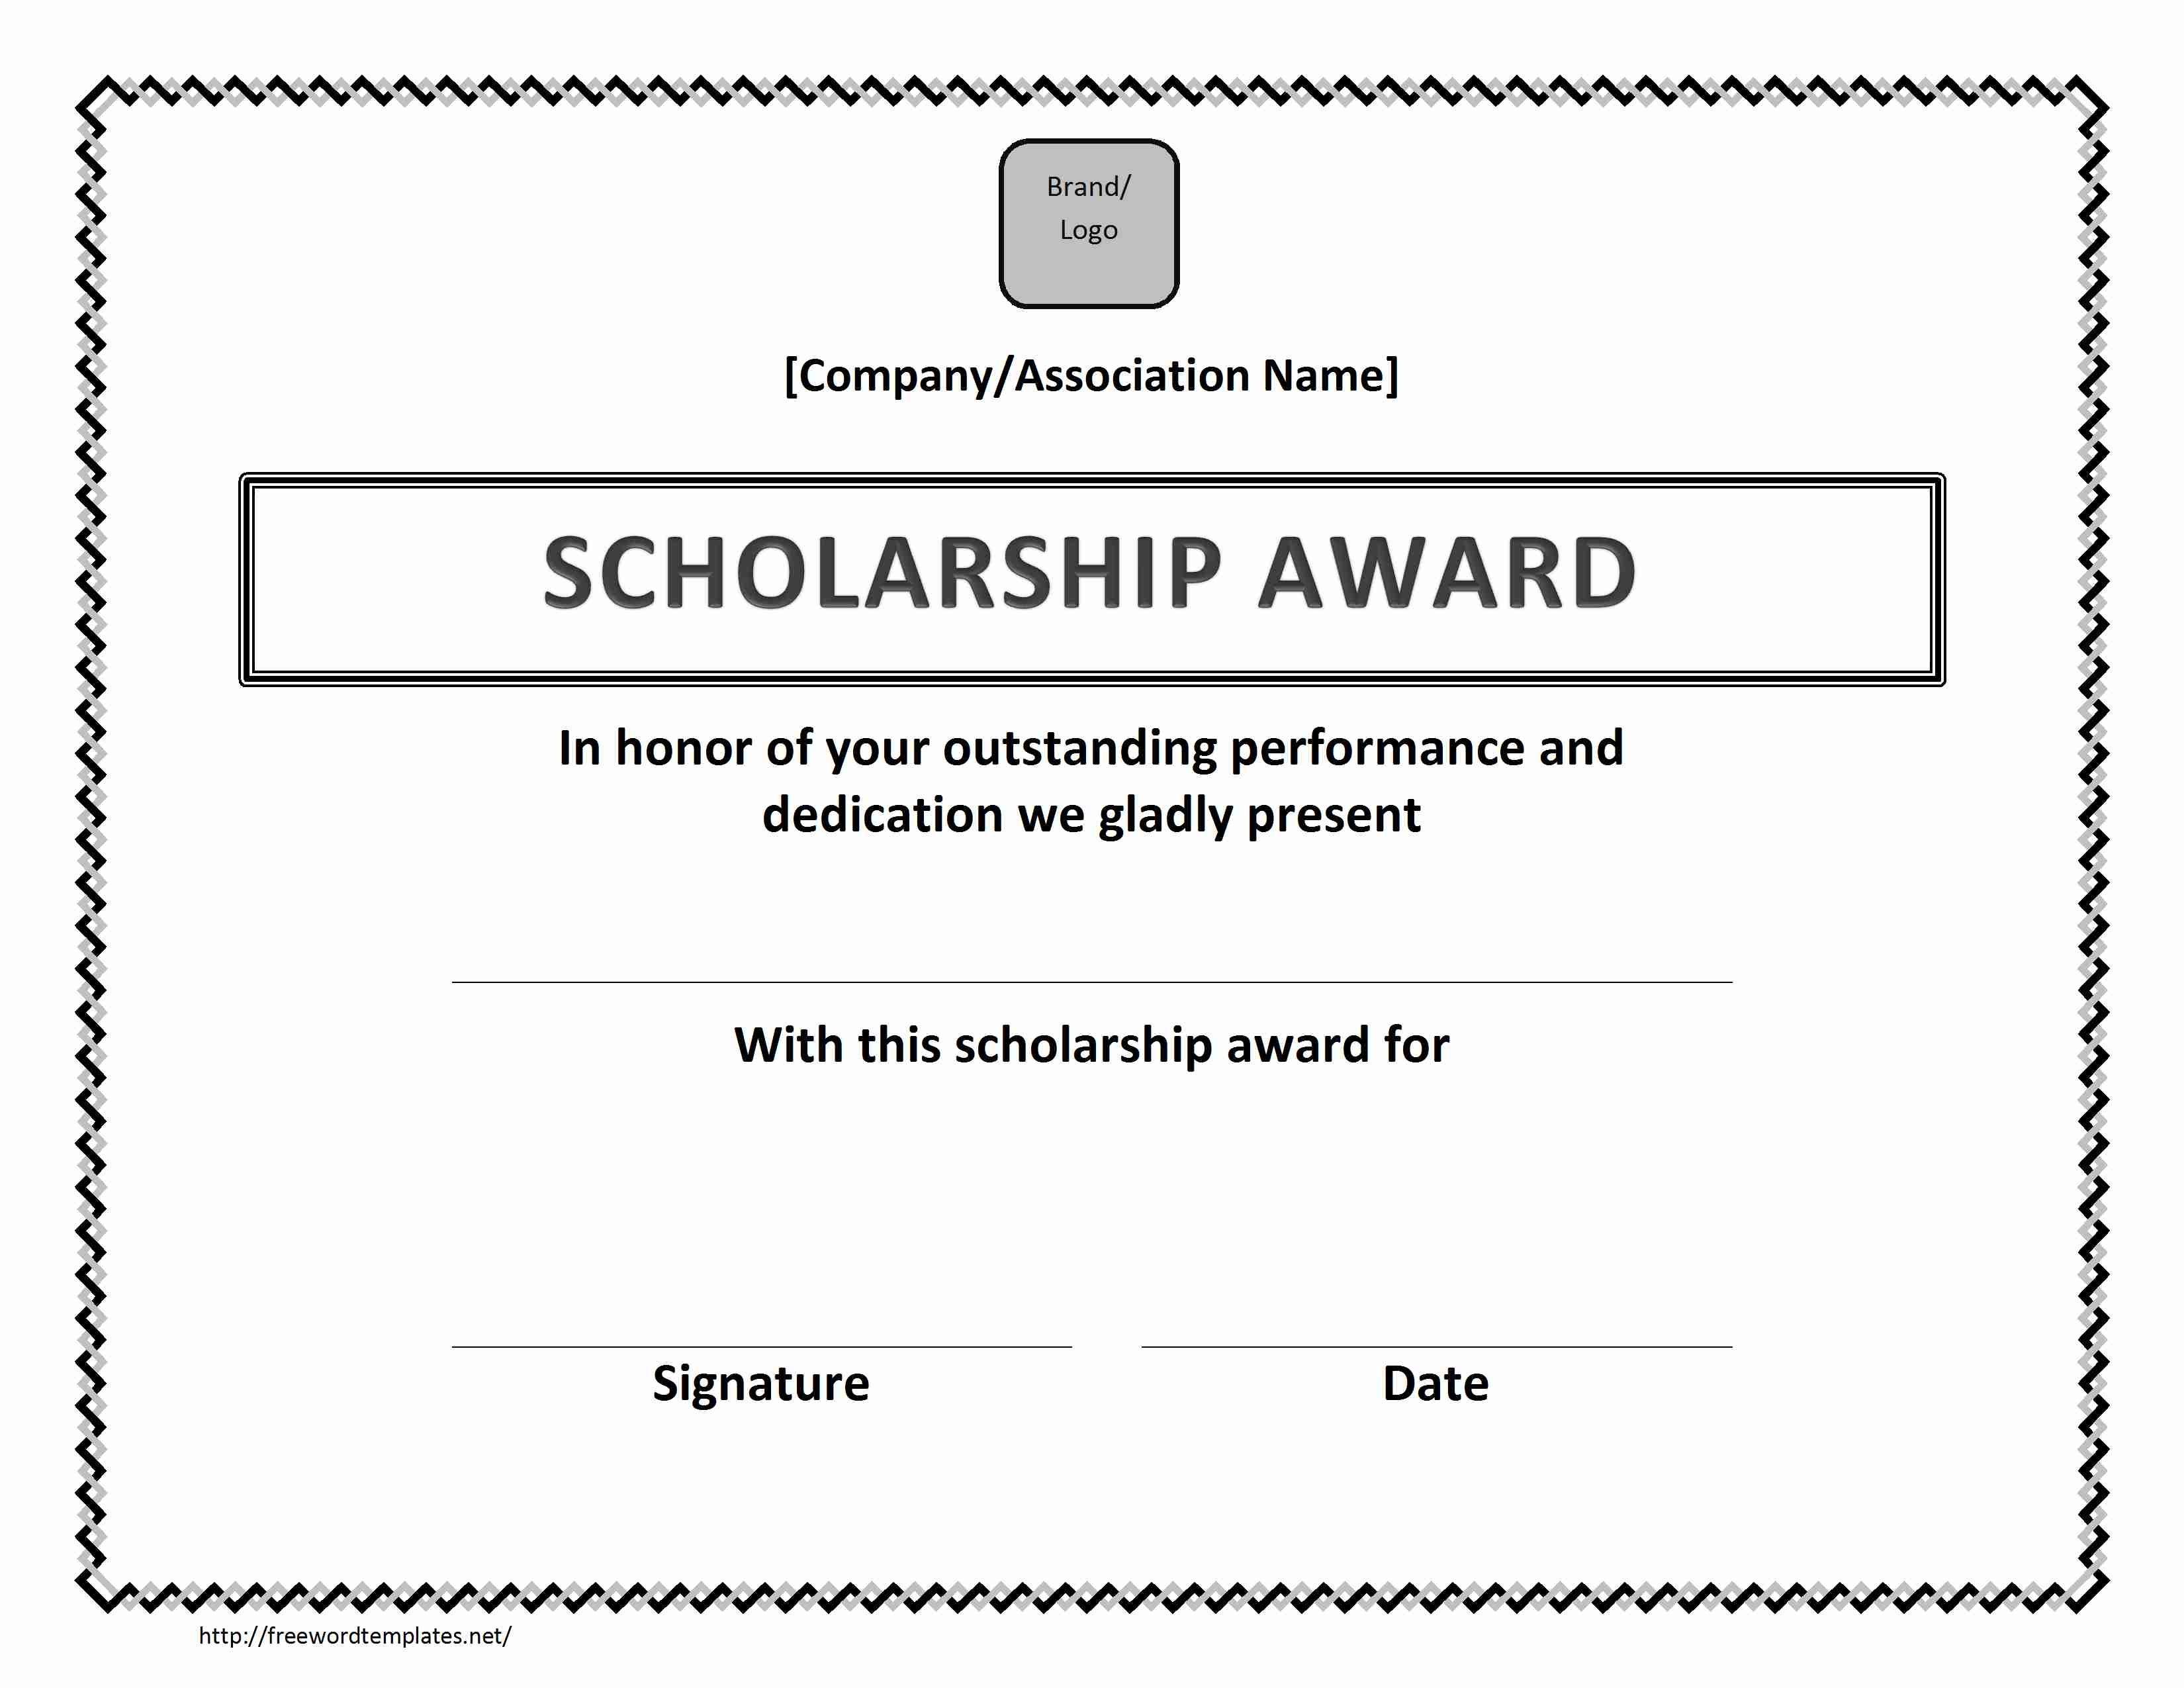 Scholarship Award Certificate With Microsoft Word Award Certificate Template